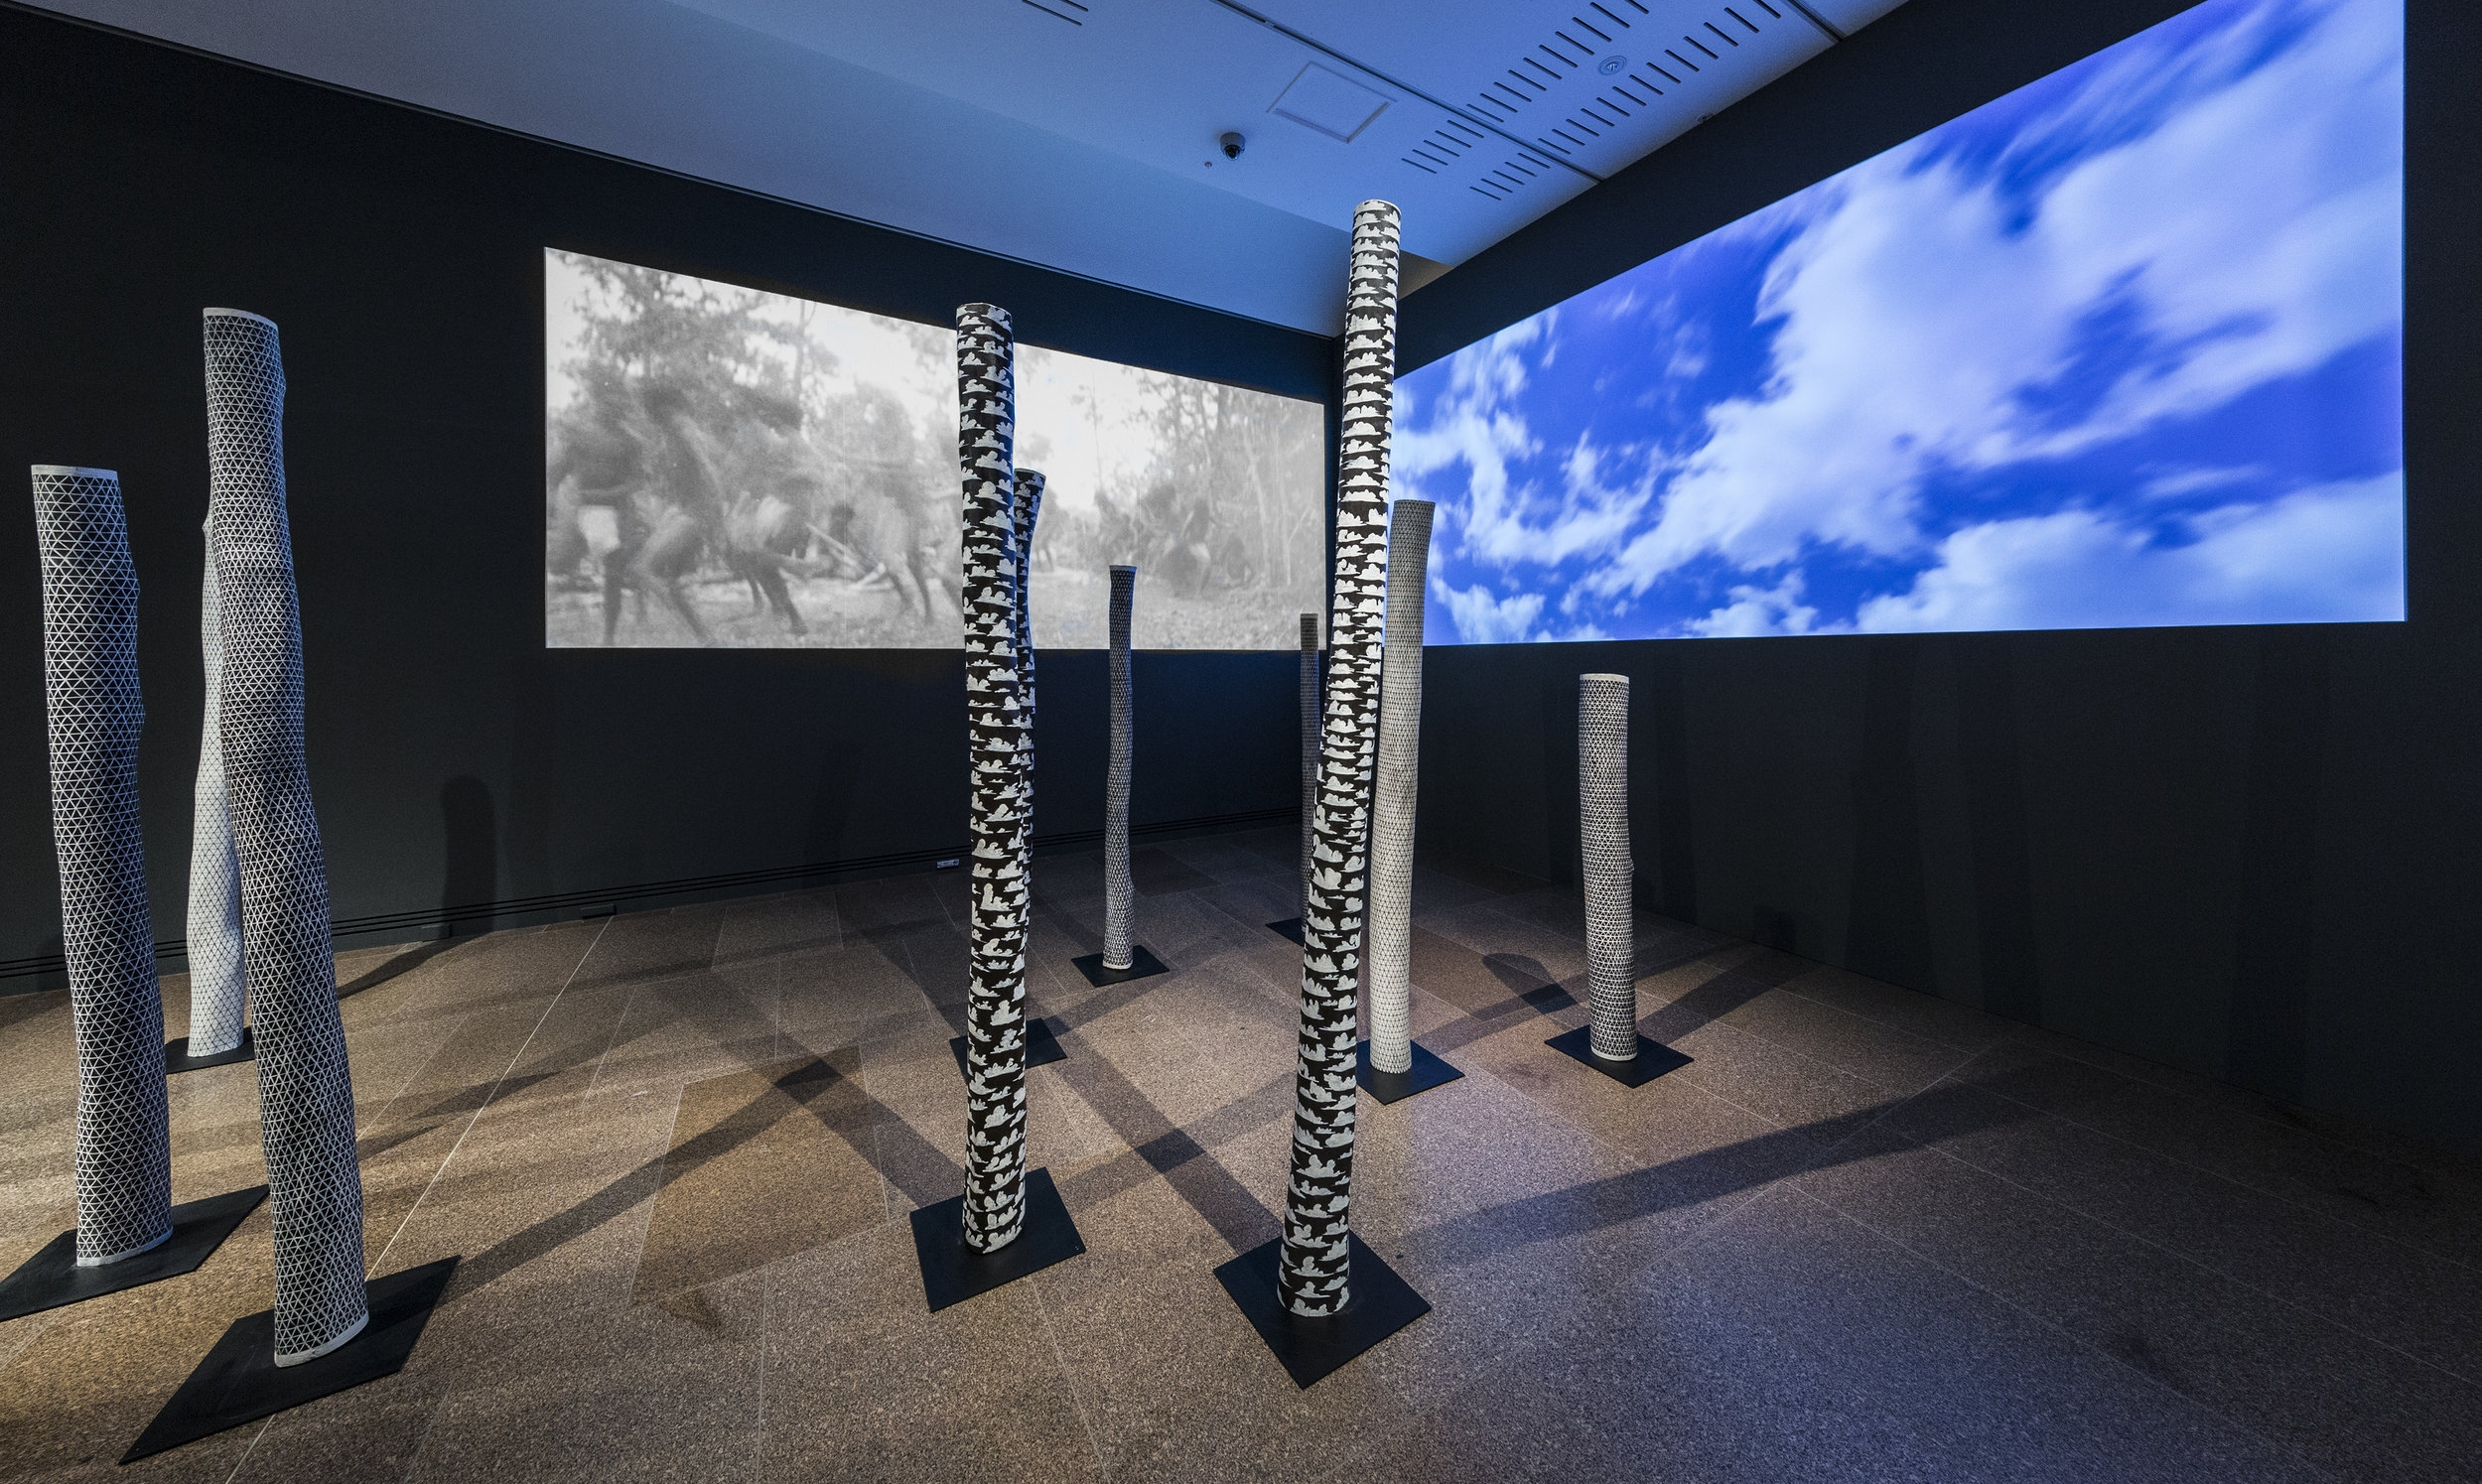 Installation view 2017 TARNANTHI: Festival of Contemporary Aboriginal & Torres Strait Islander Art, featuring  Wunyupini (Cloud ),   Ishmael Marika ,  Art Gallery of South Australia